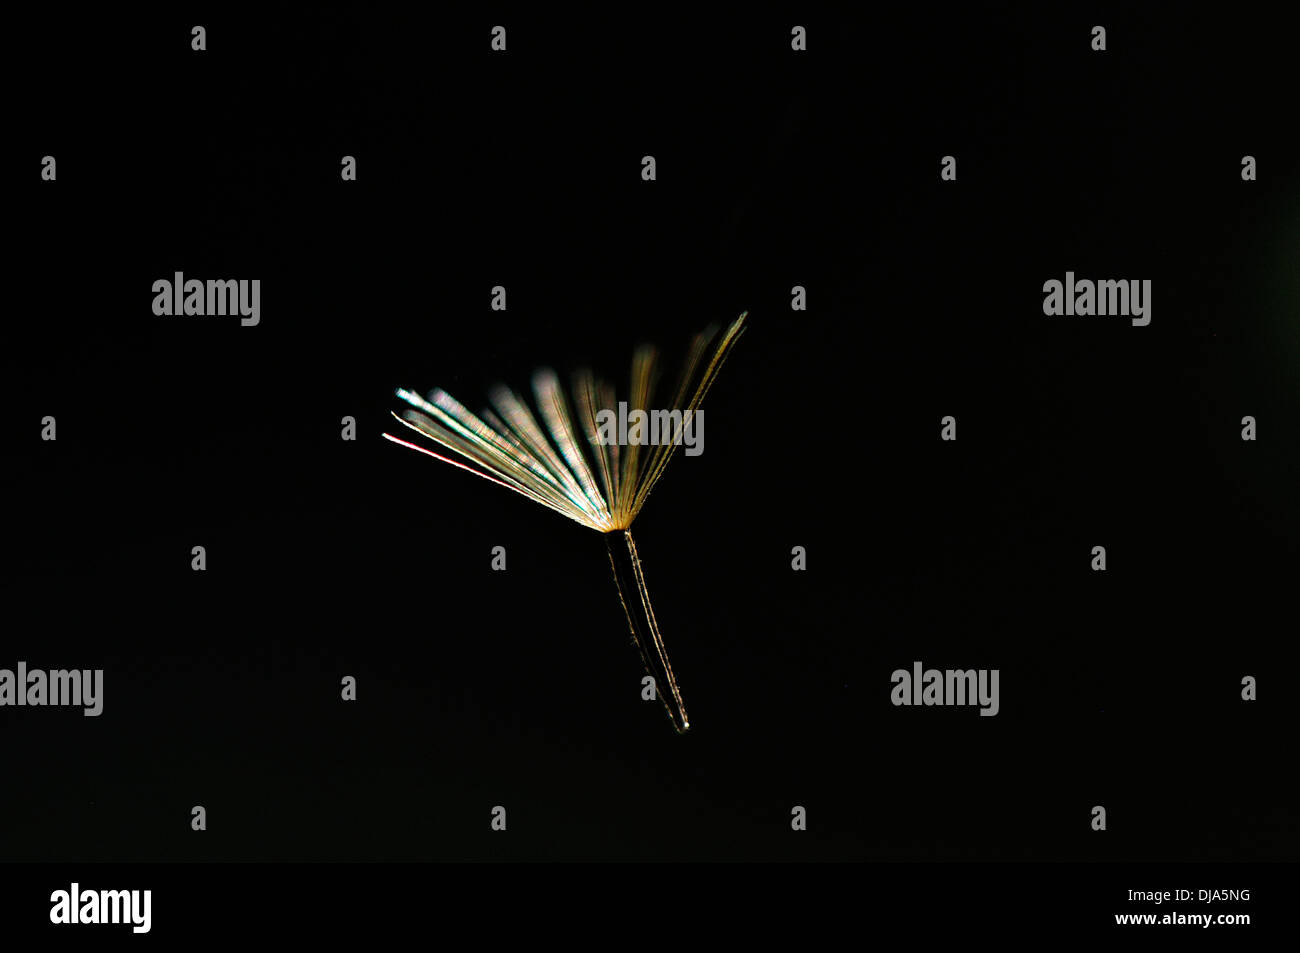 Jewel -  A dandelion floret hanging on invincible strand of spider web - Stock Image